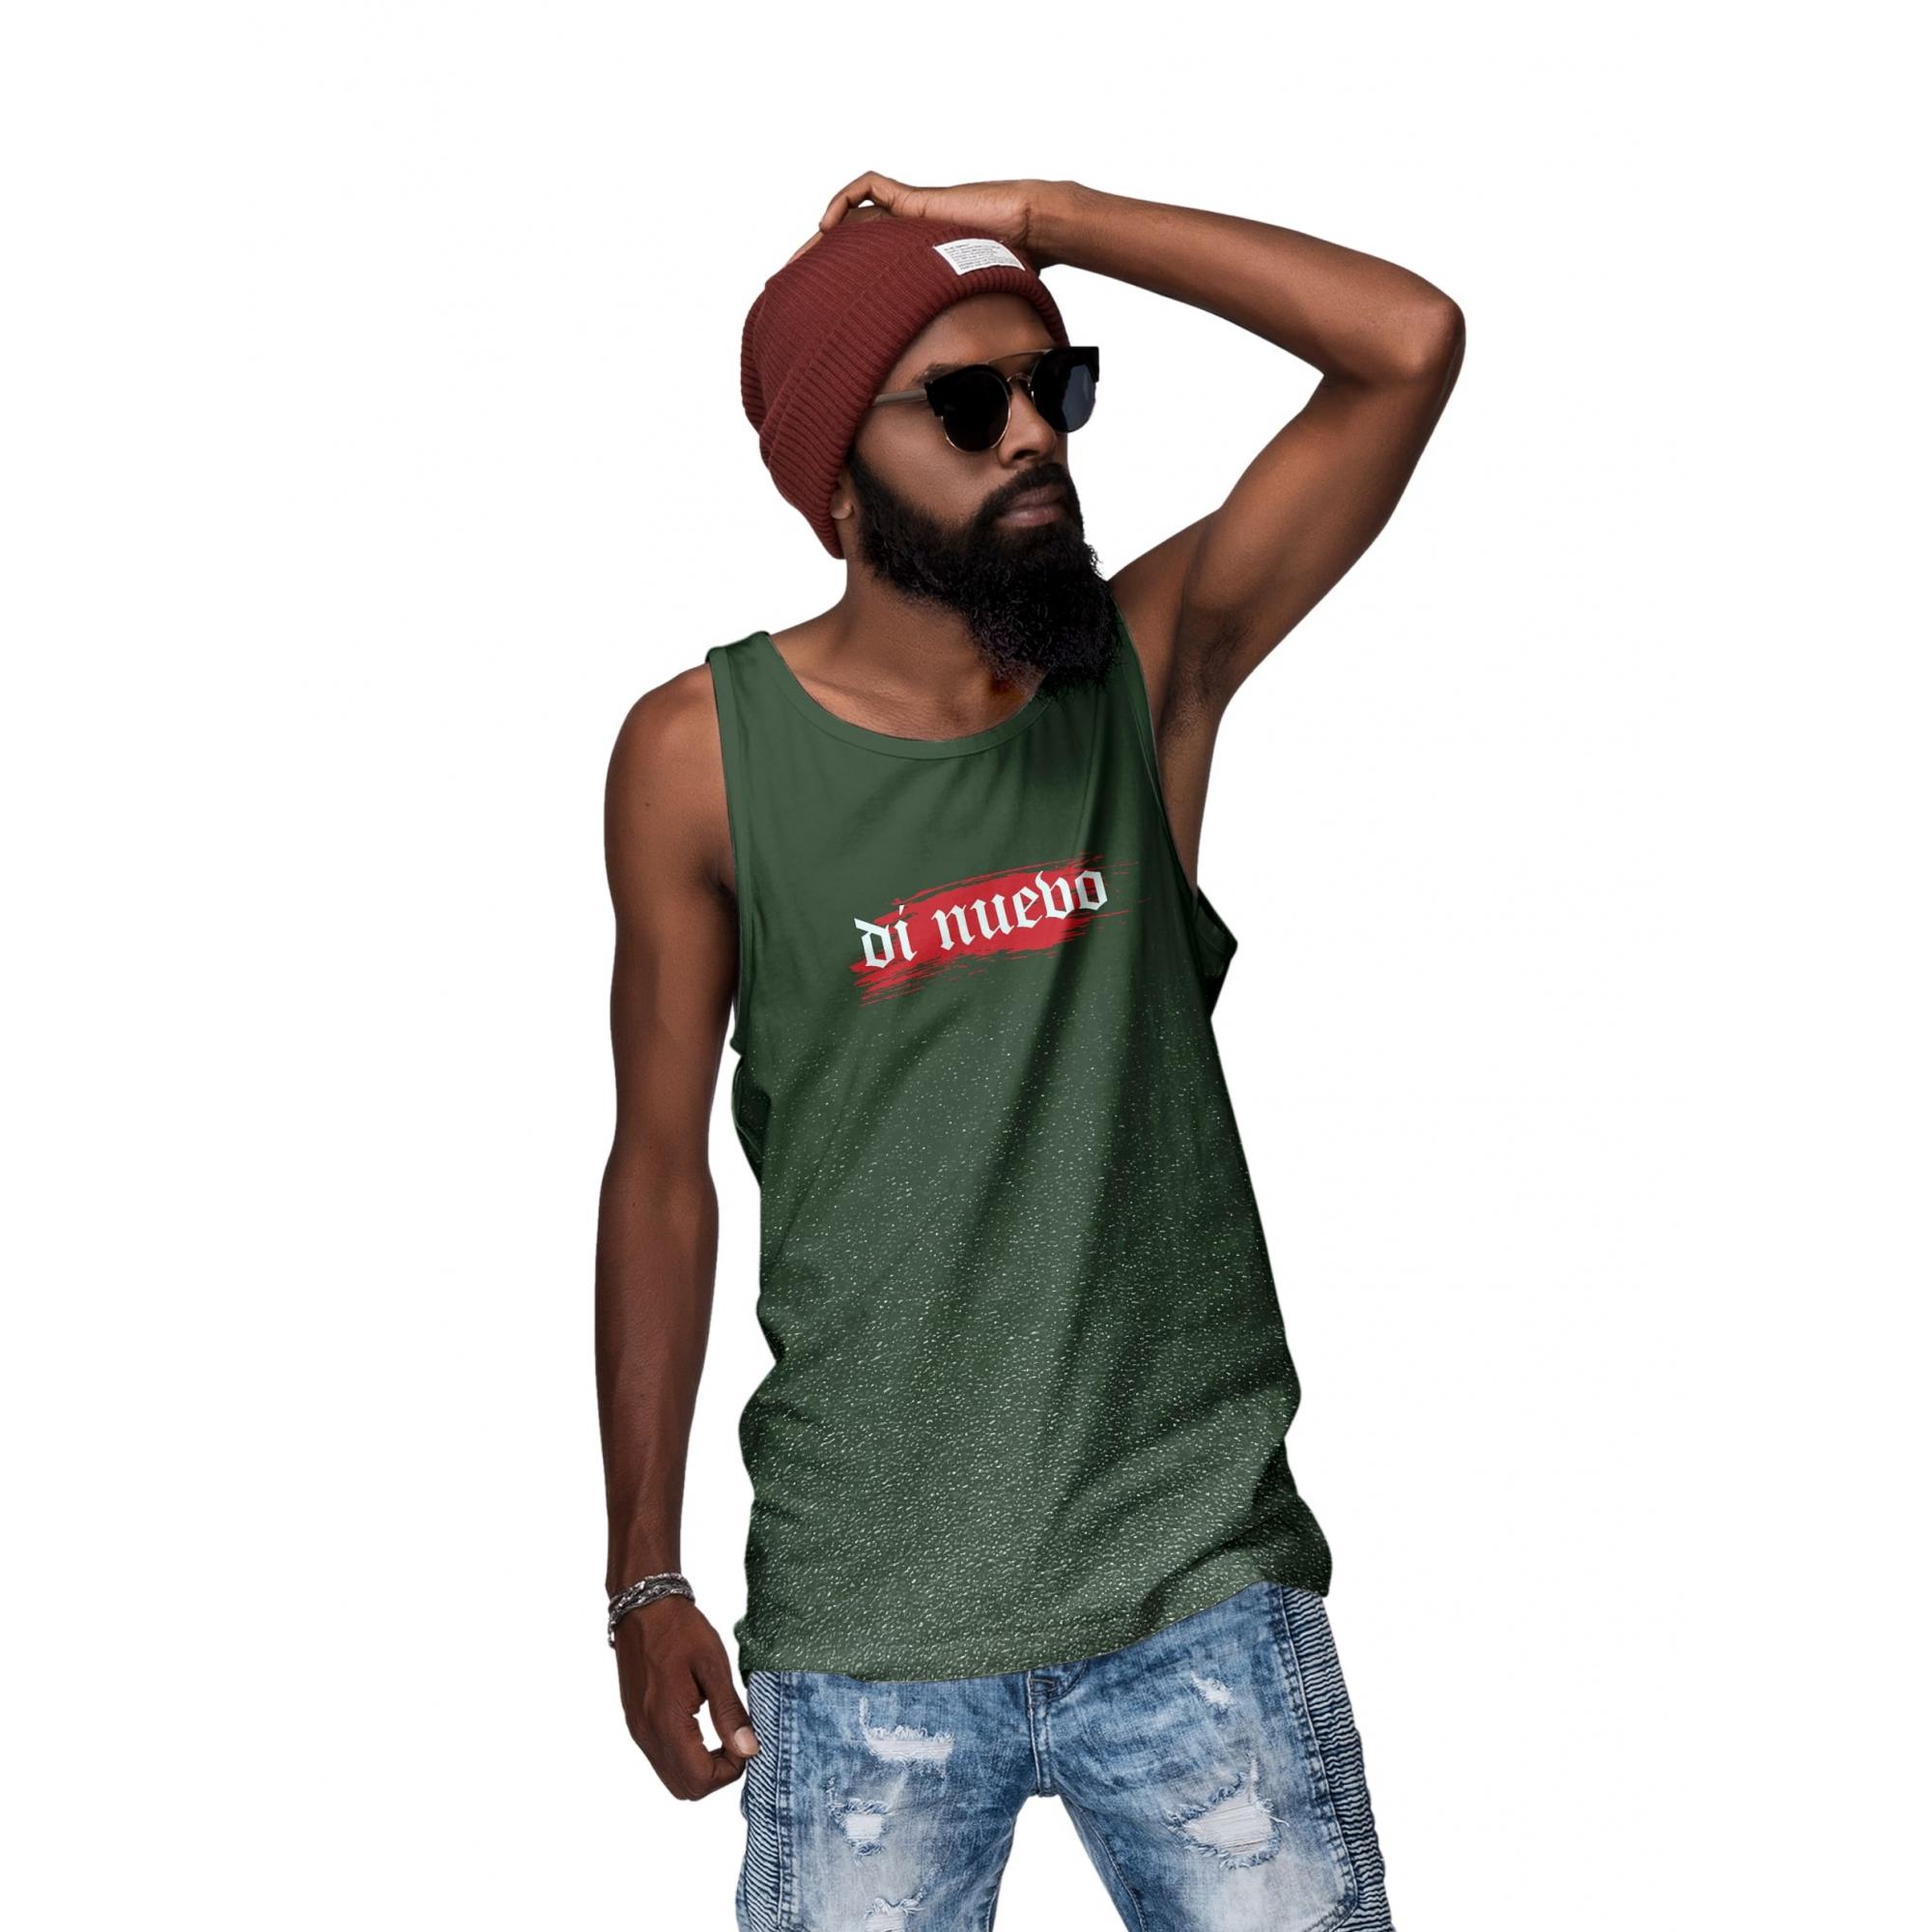 Camiseta Regata Masculiuna Efeito Respingo Verde